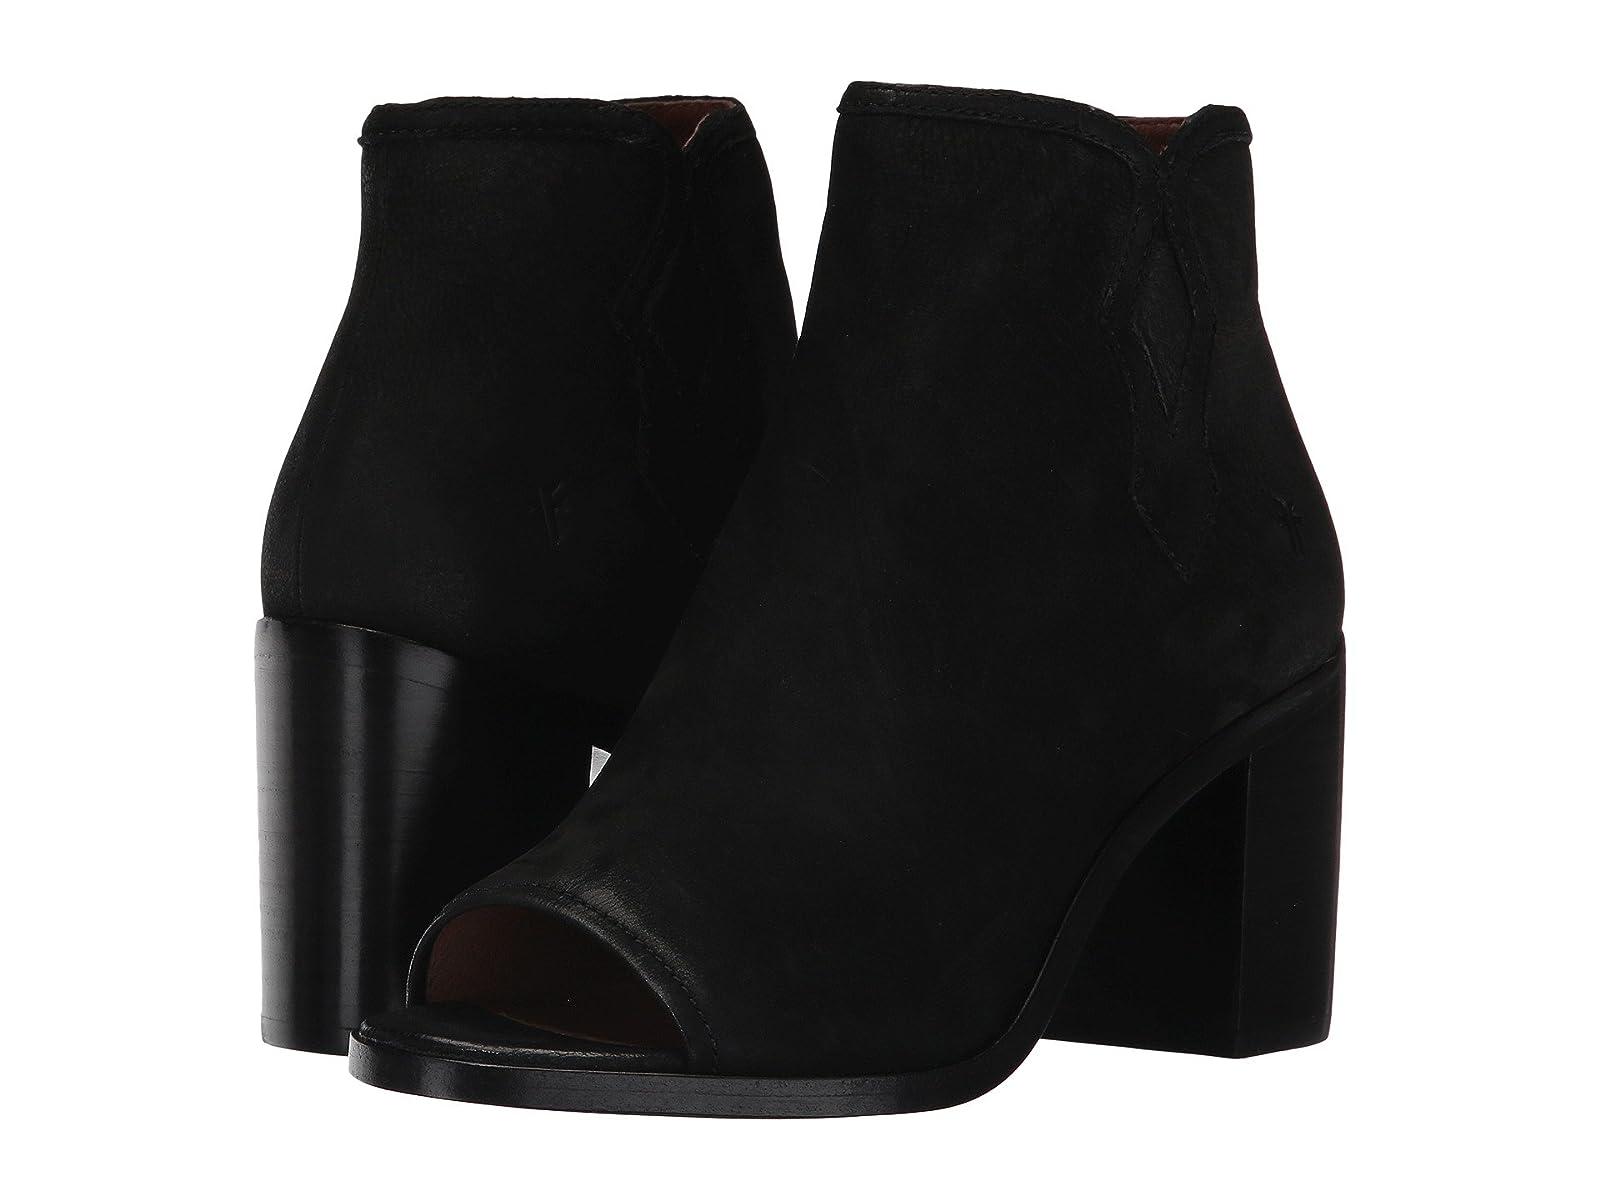 Frye Danica Peep BootieCheap and distinctive eye-catching shoes